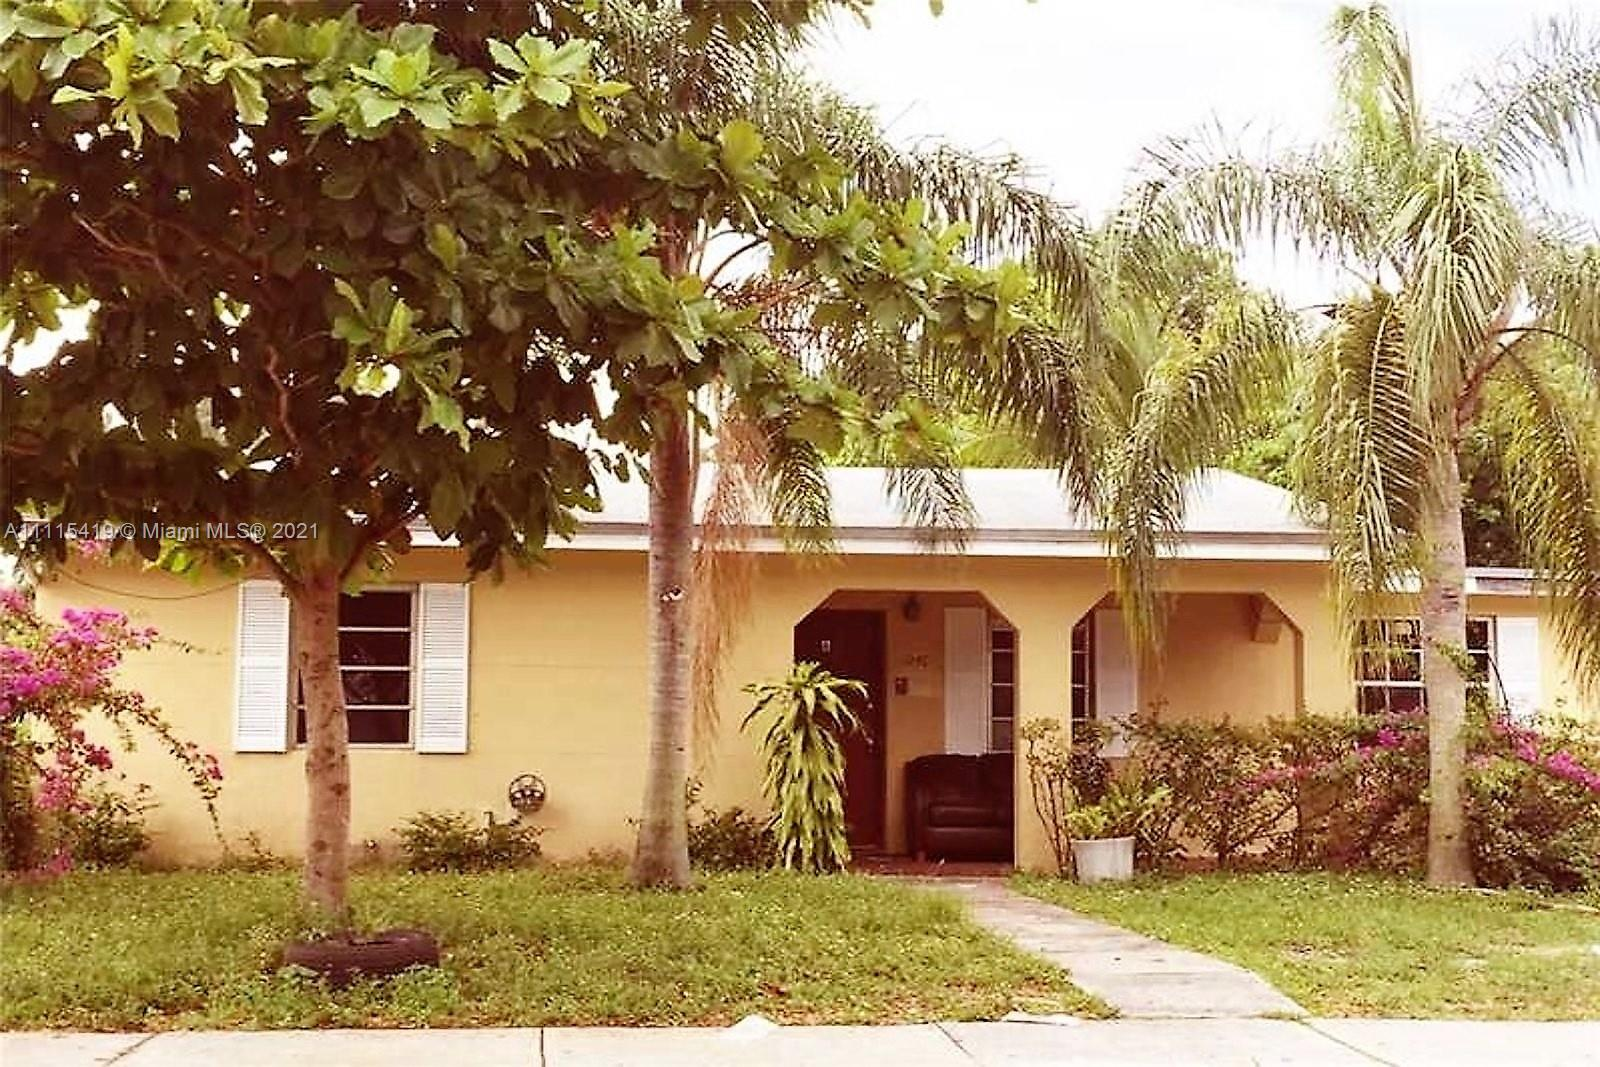 Single Family Home For Sale BISCAYNE HIGHLANDS1,335 Sqft